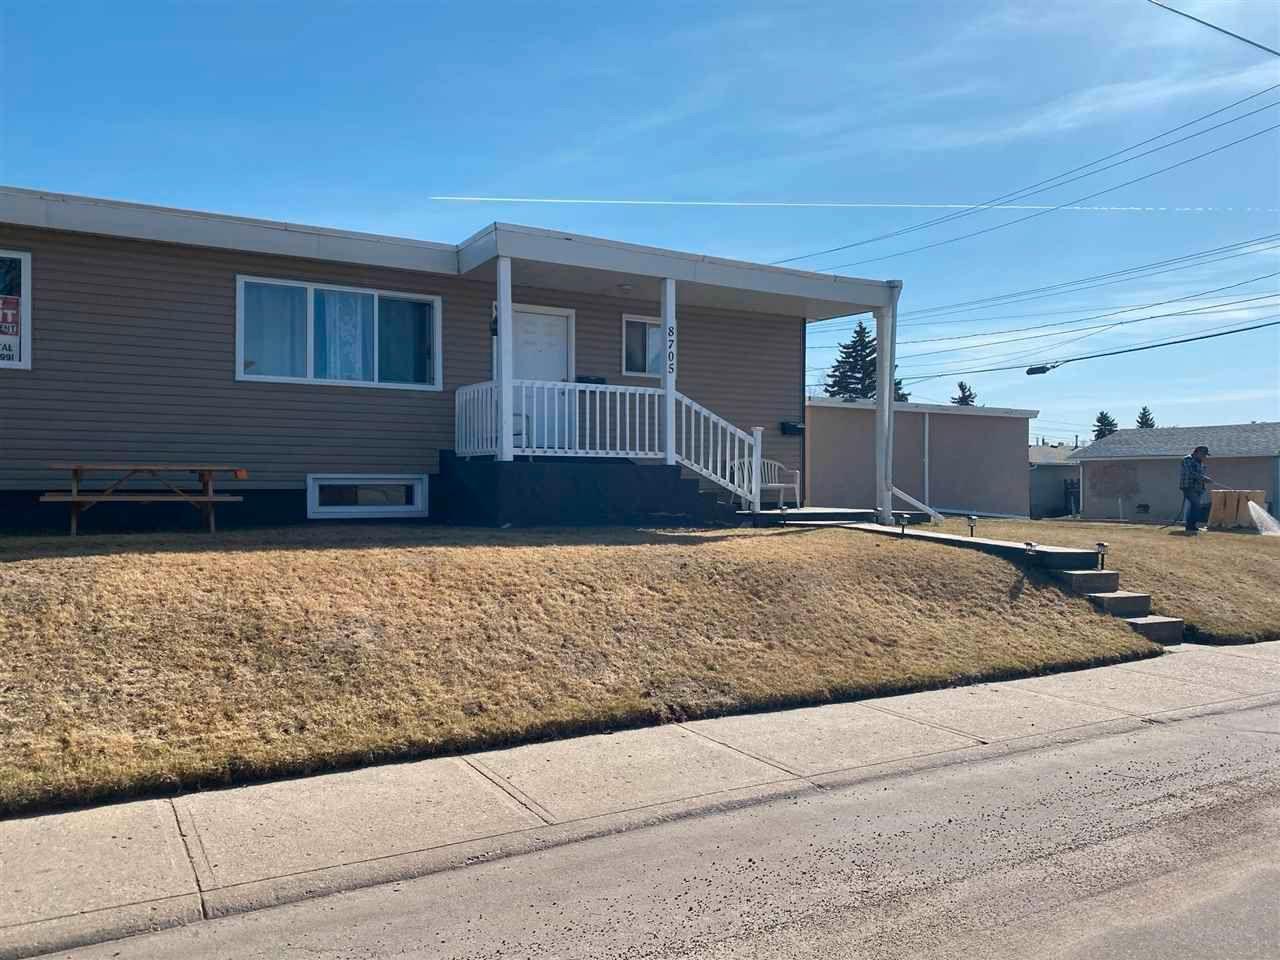 Main Photo: 8703-8705 128 Avenue in Edmonton: Zone 02 House for sale : MLS®# E4241683